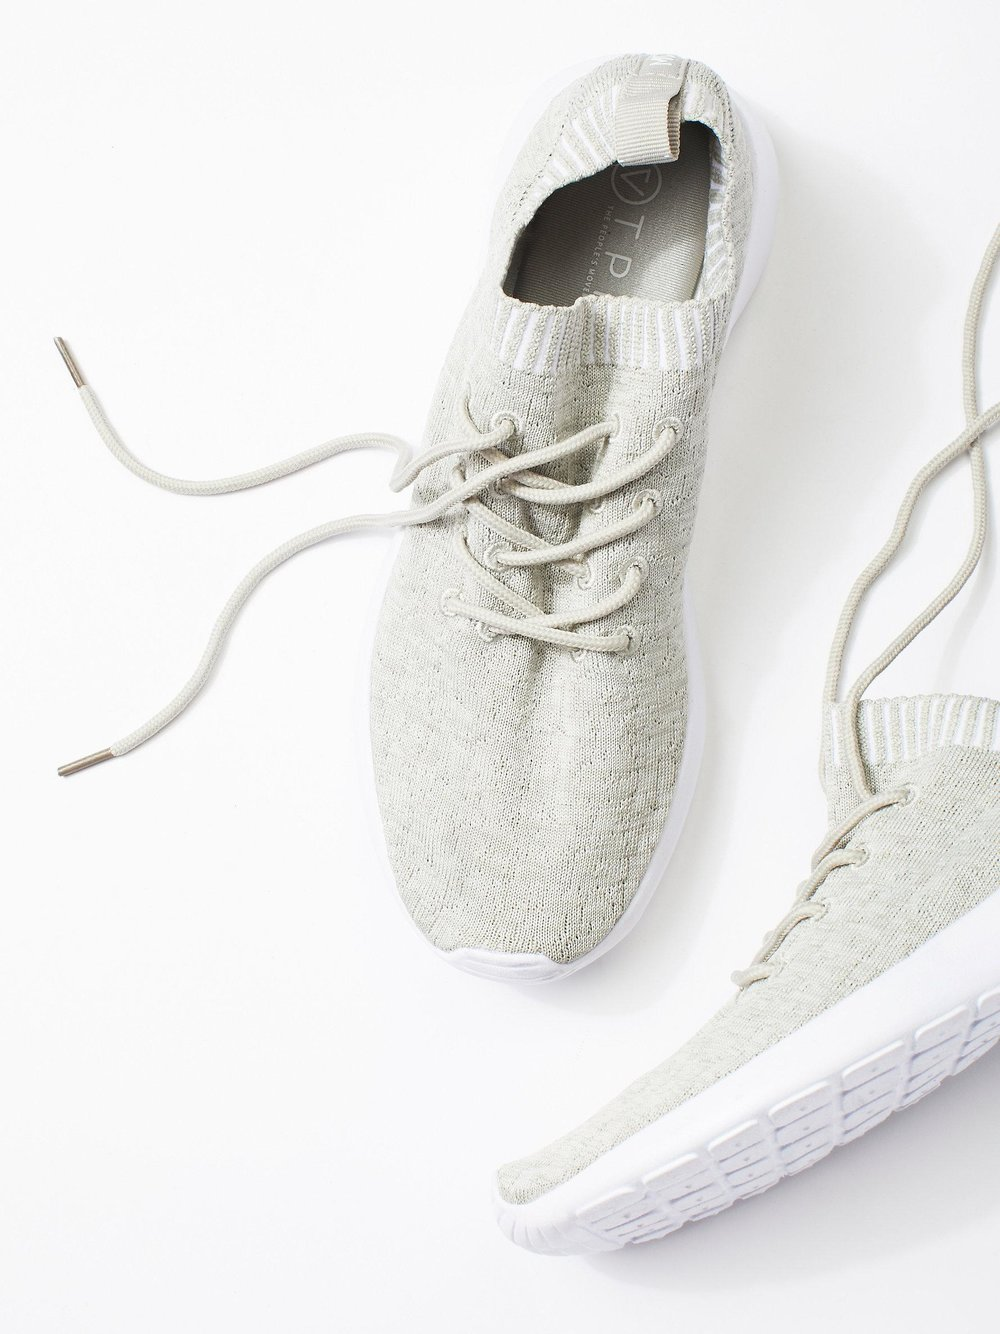 Movmt Cabo Sneaker Light Grey